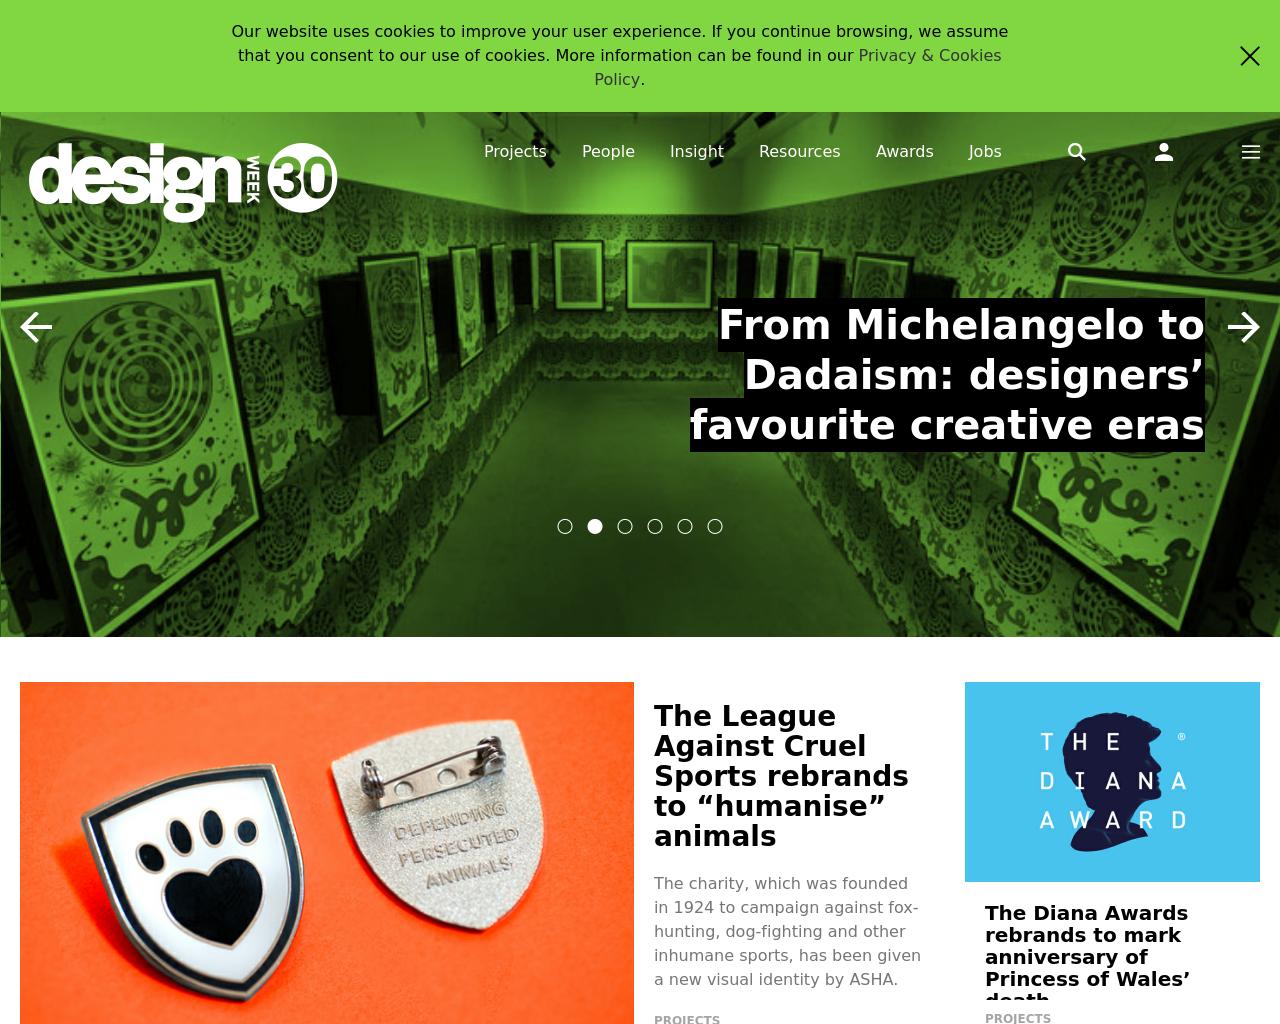 Design-Week-Advertising-Reviews-Pricing